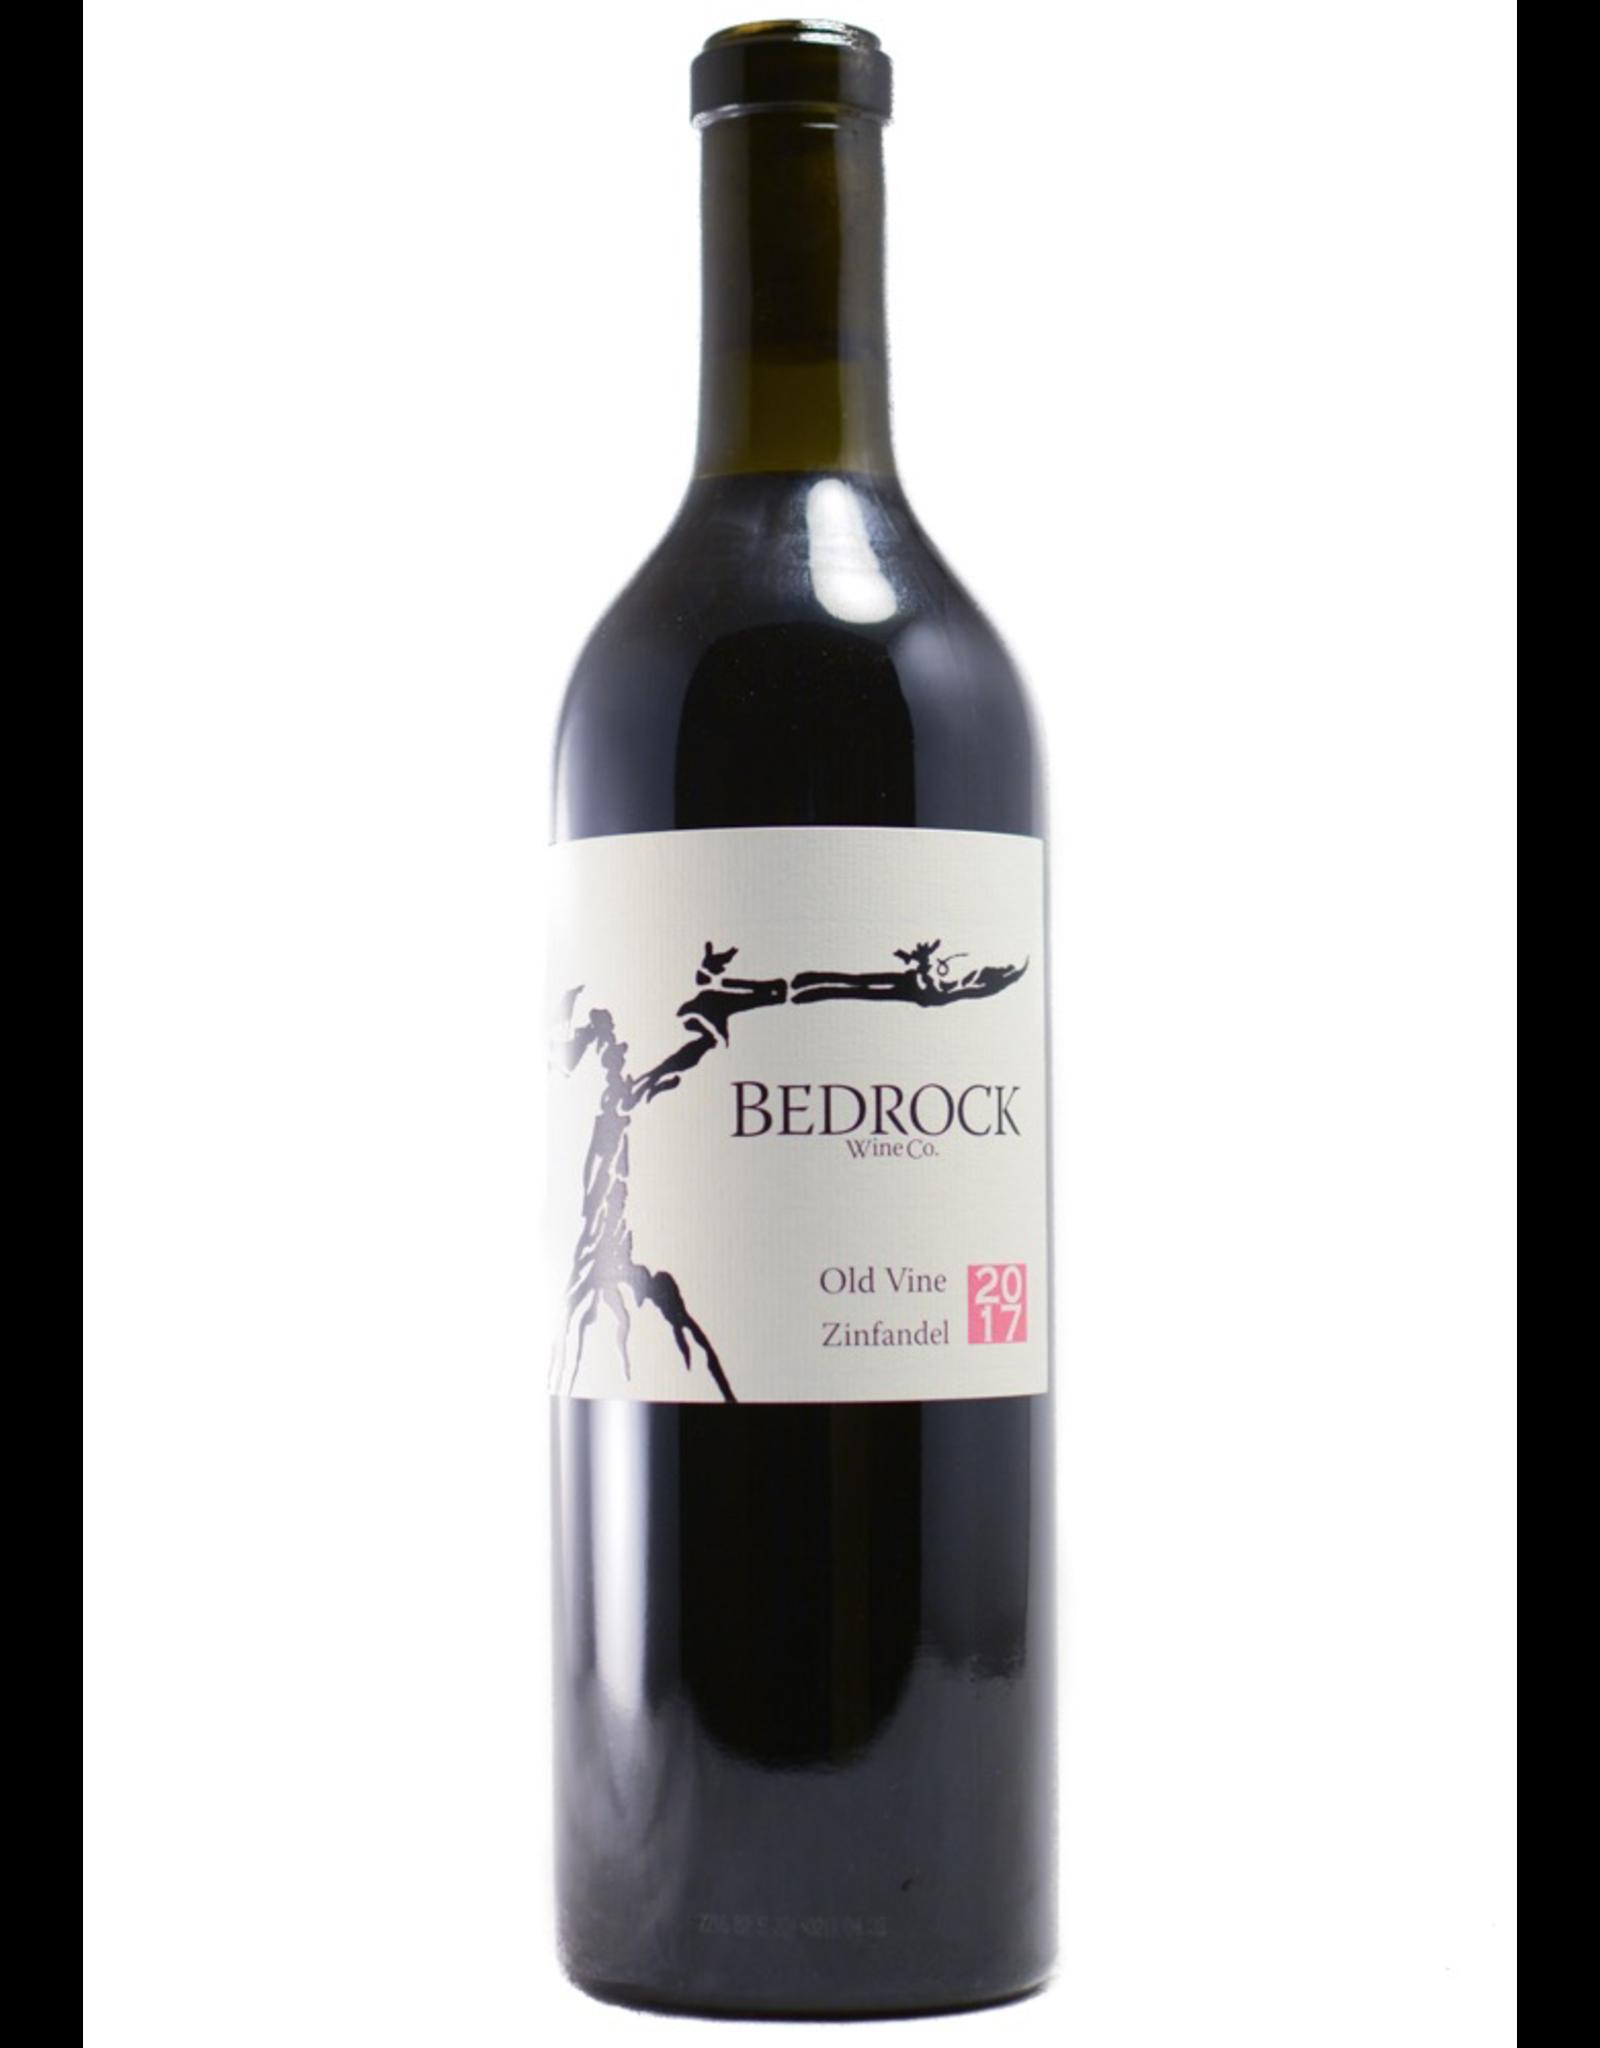 Red Wine 2017, Bedrock Wine Co. Old Vine Zinfandel, Zinfandel, Sonoma County, Northern Coast, California,14.4% Alc, CTnr, WS93, RP91